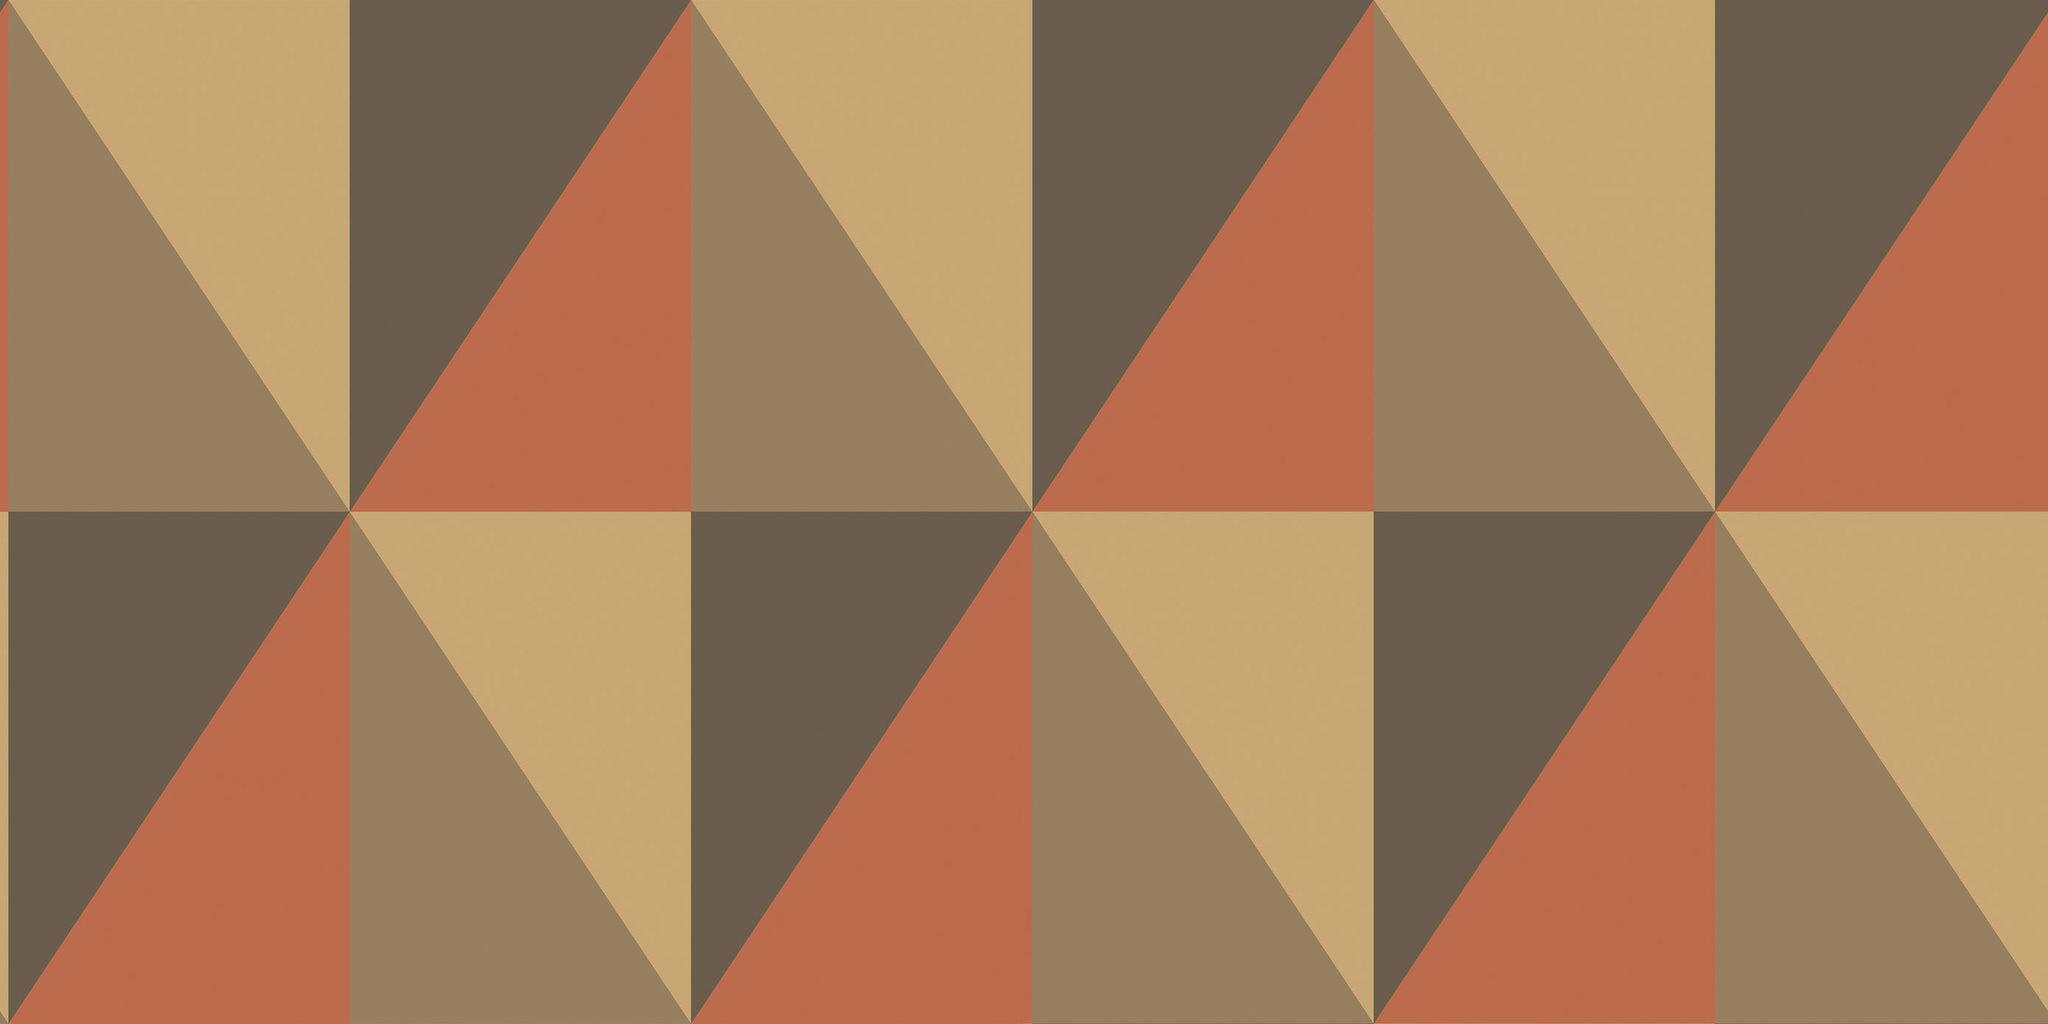 Обои Cole & Son Geometric II 105/10041, интернет магазин Волео